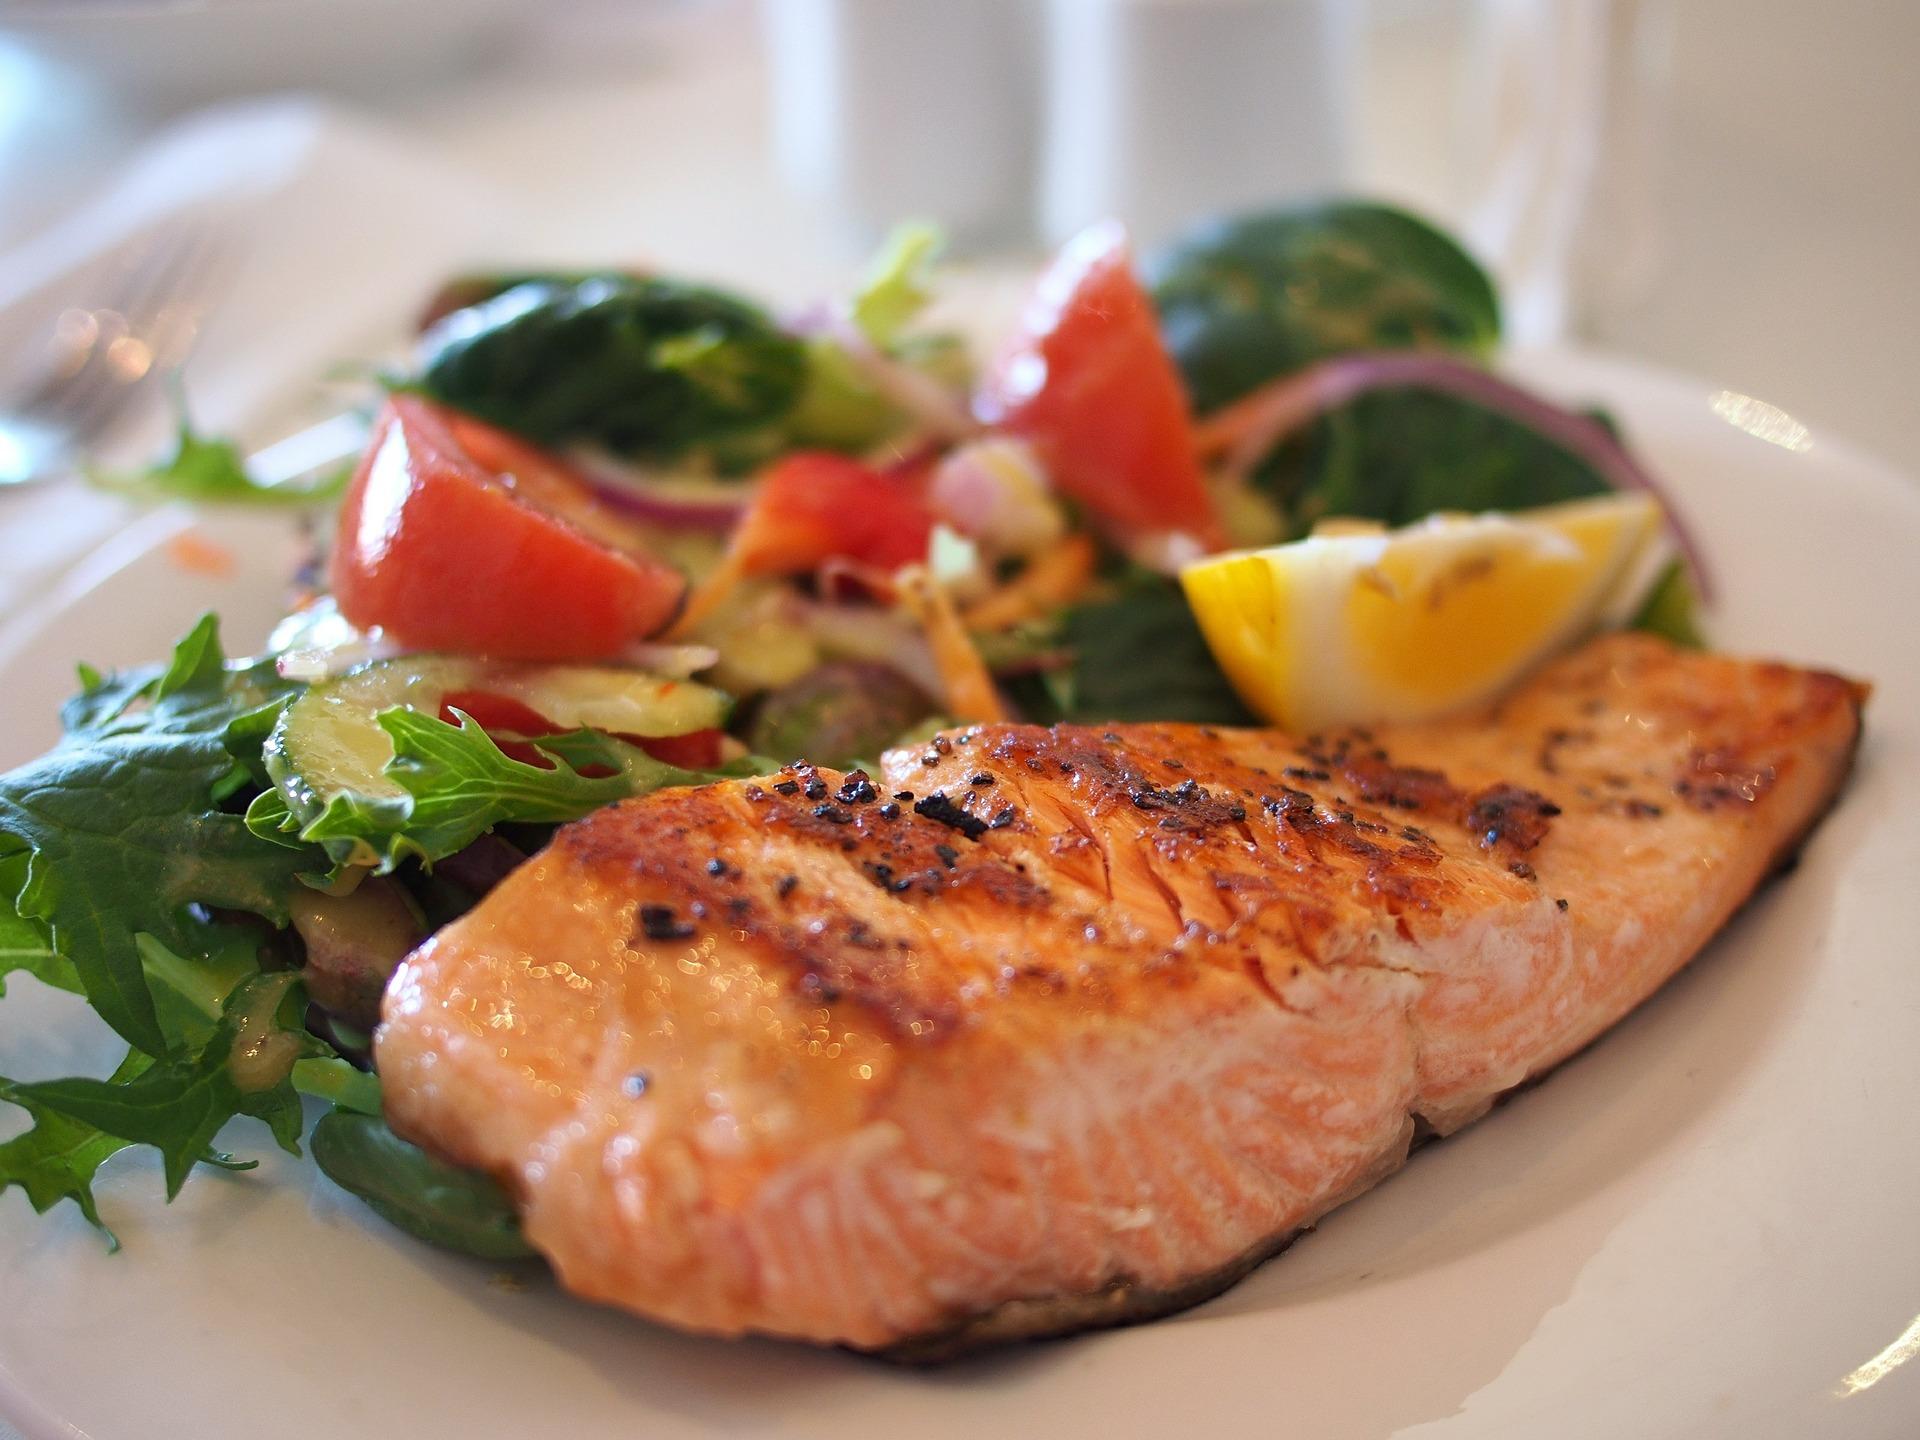 pescatarian salad